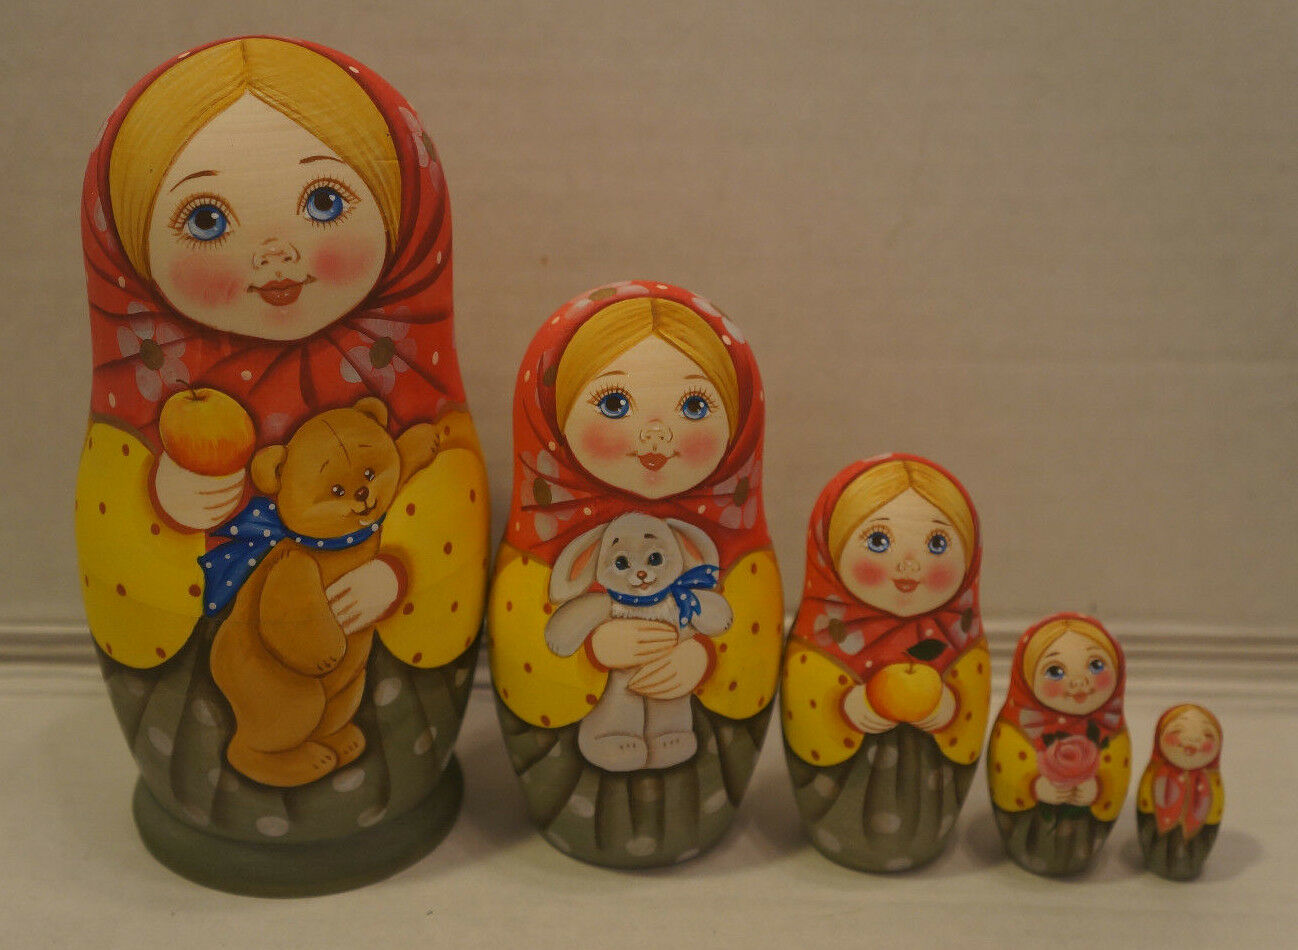 Russian Matryoshka -  Wooden Nesting bambolas - 5 Pieces Unique Coloreeeeing - Set  10  più economico